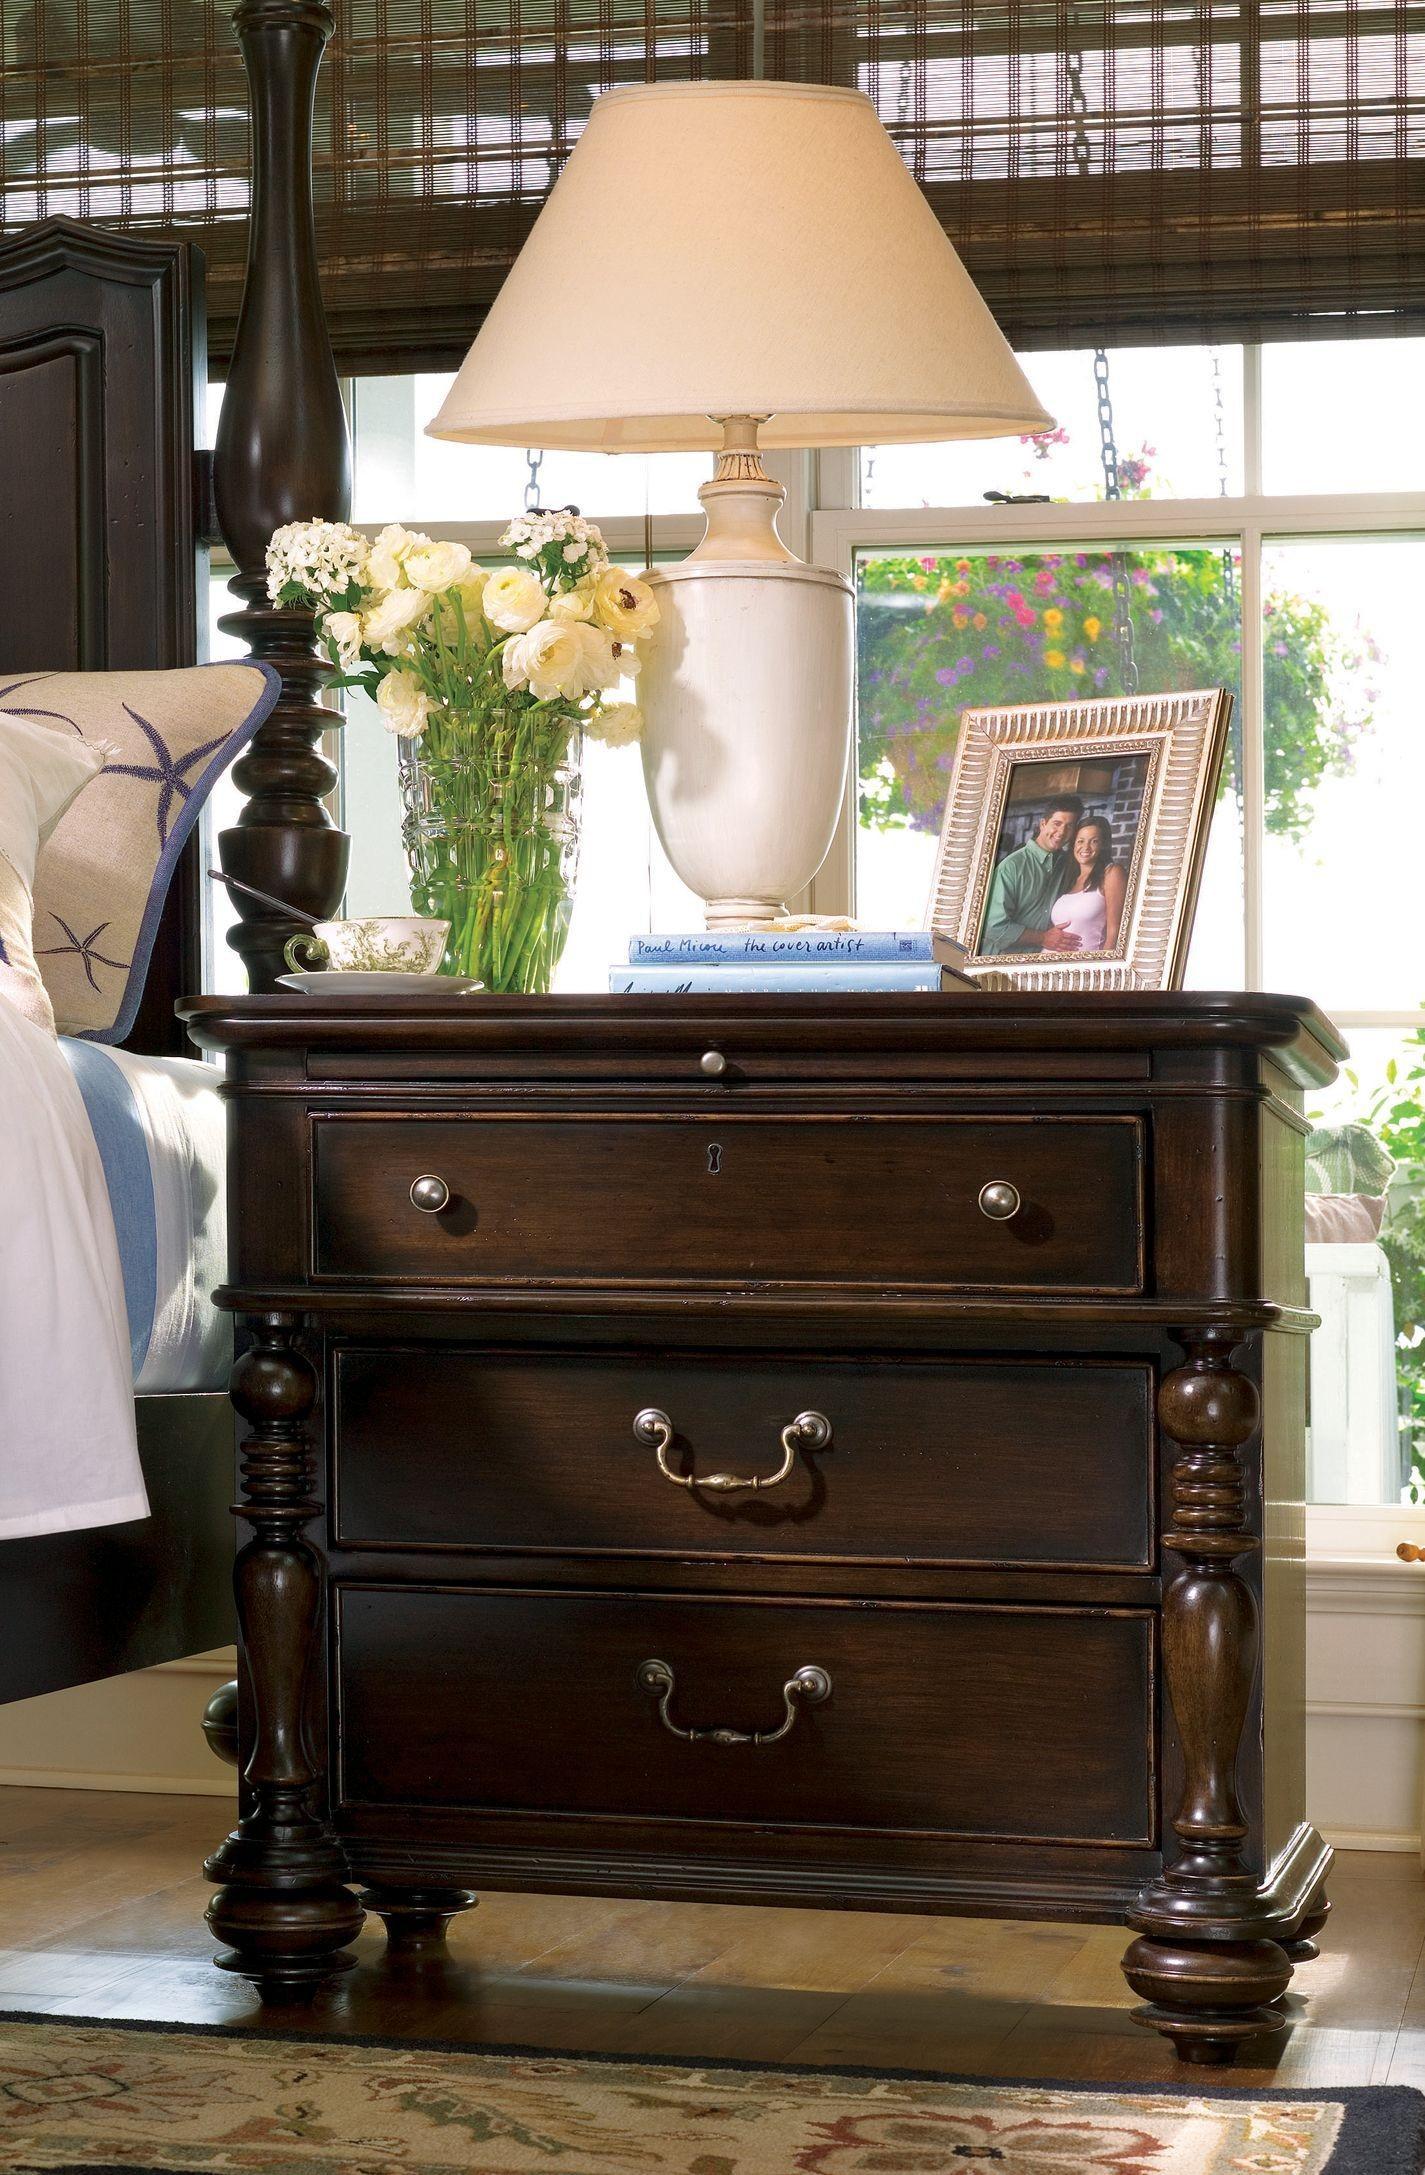 Paula Deen Home Tobacco 3 Drawer Nightstand From Paula Deen 932350 Coleman Furniture